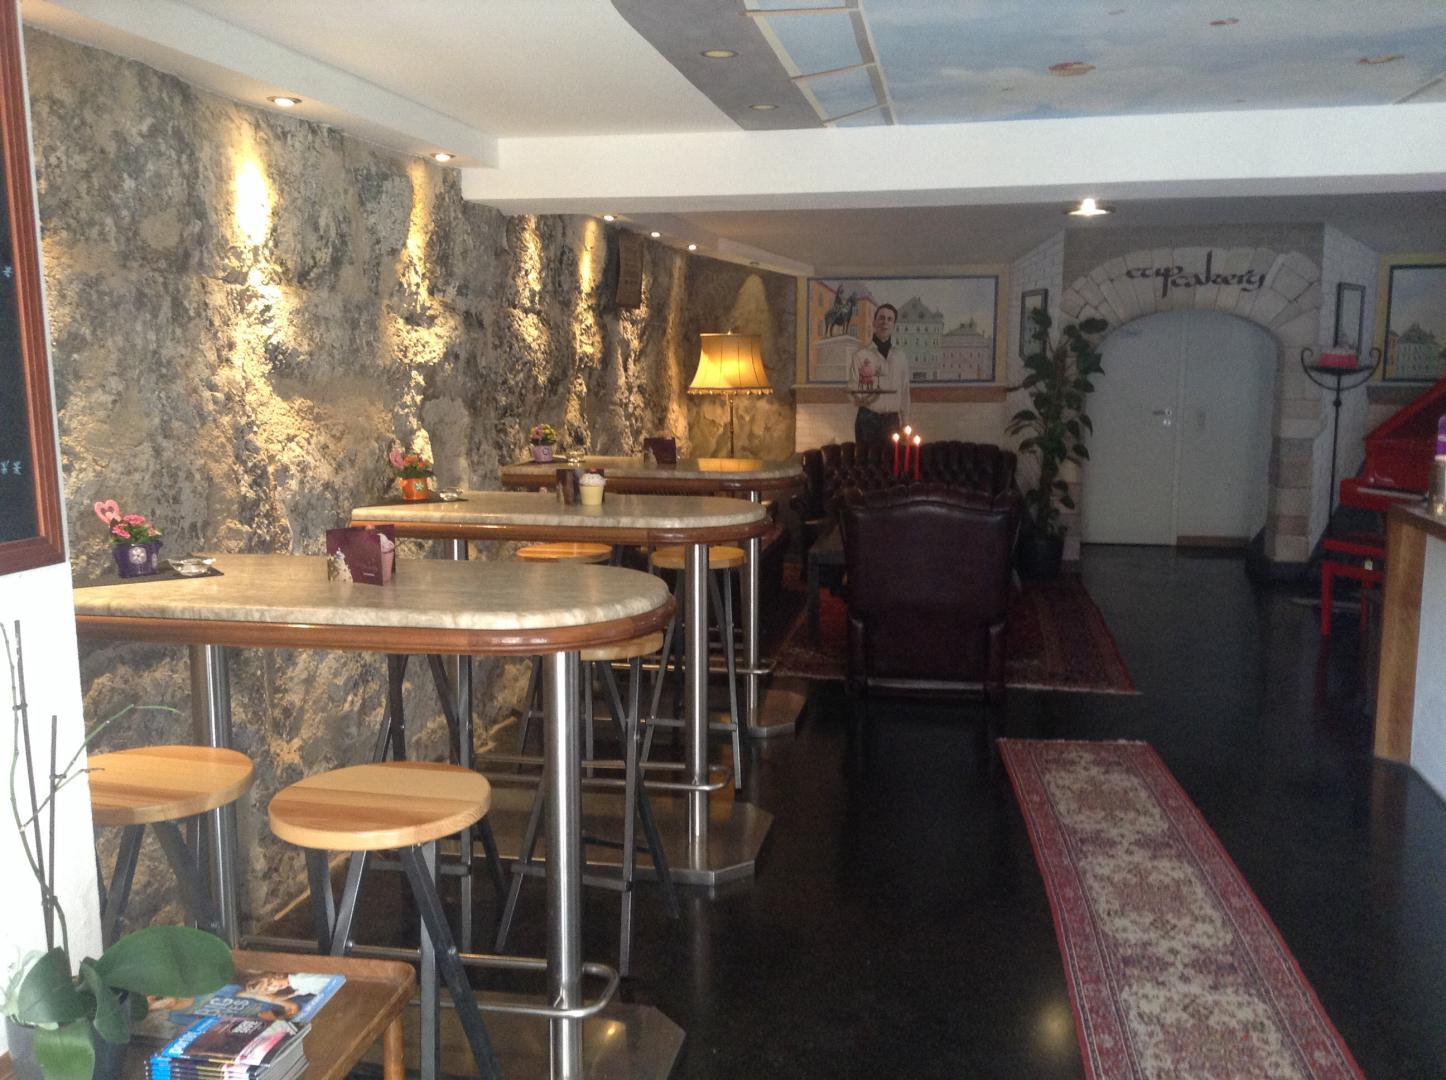 ffnungszeiten cupcakery regensburg domstra e 1. Black Bedroom Furniture Sets. Home Design Ideas